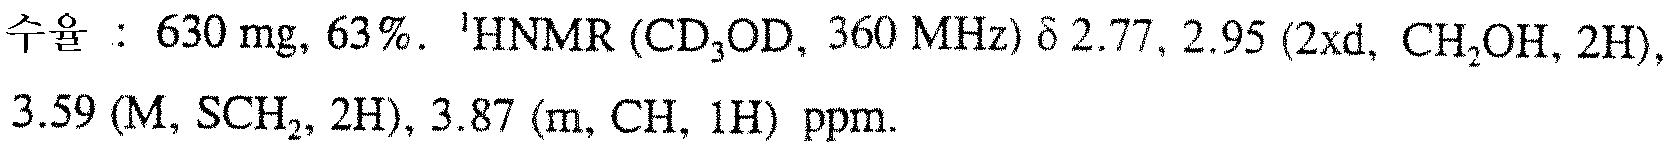 Figure 112001027173353-pct00008